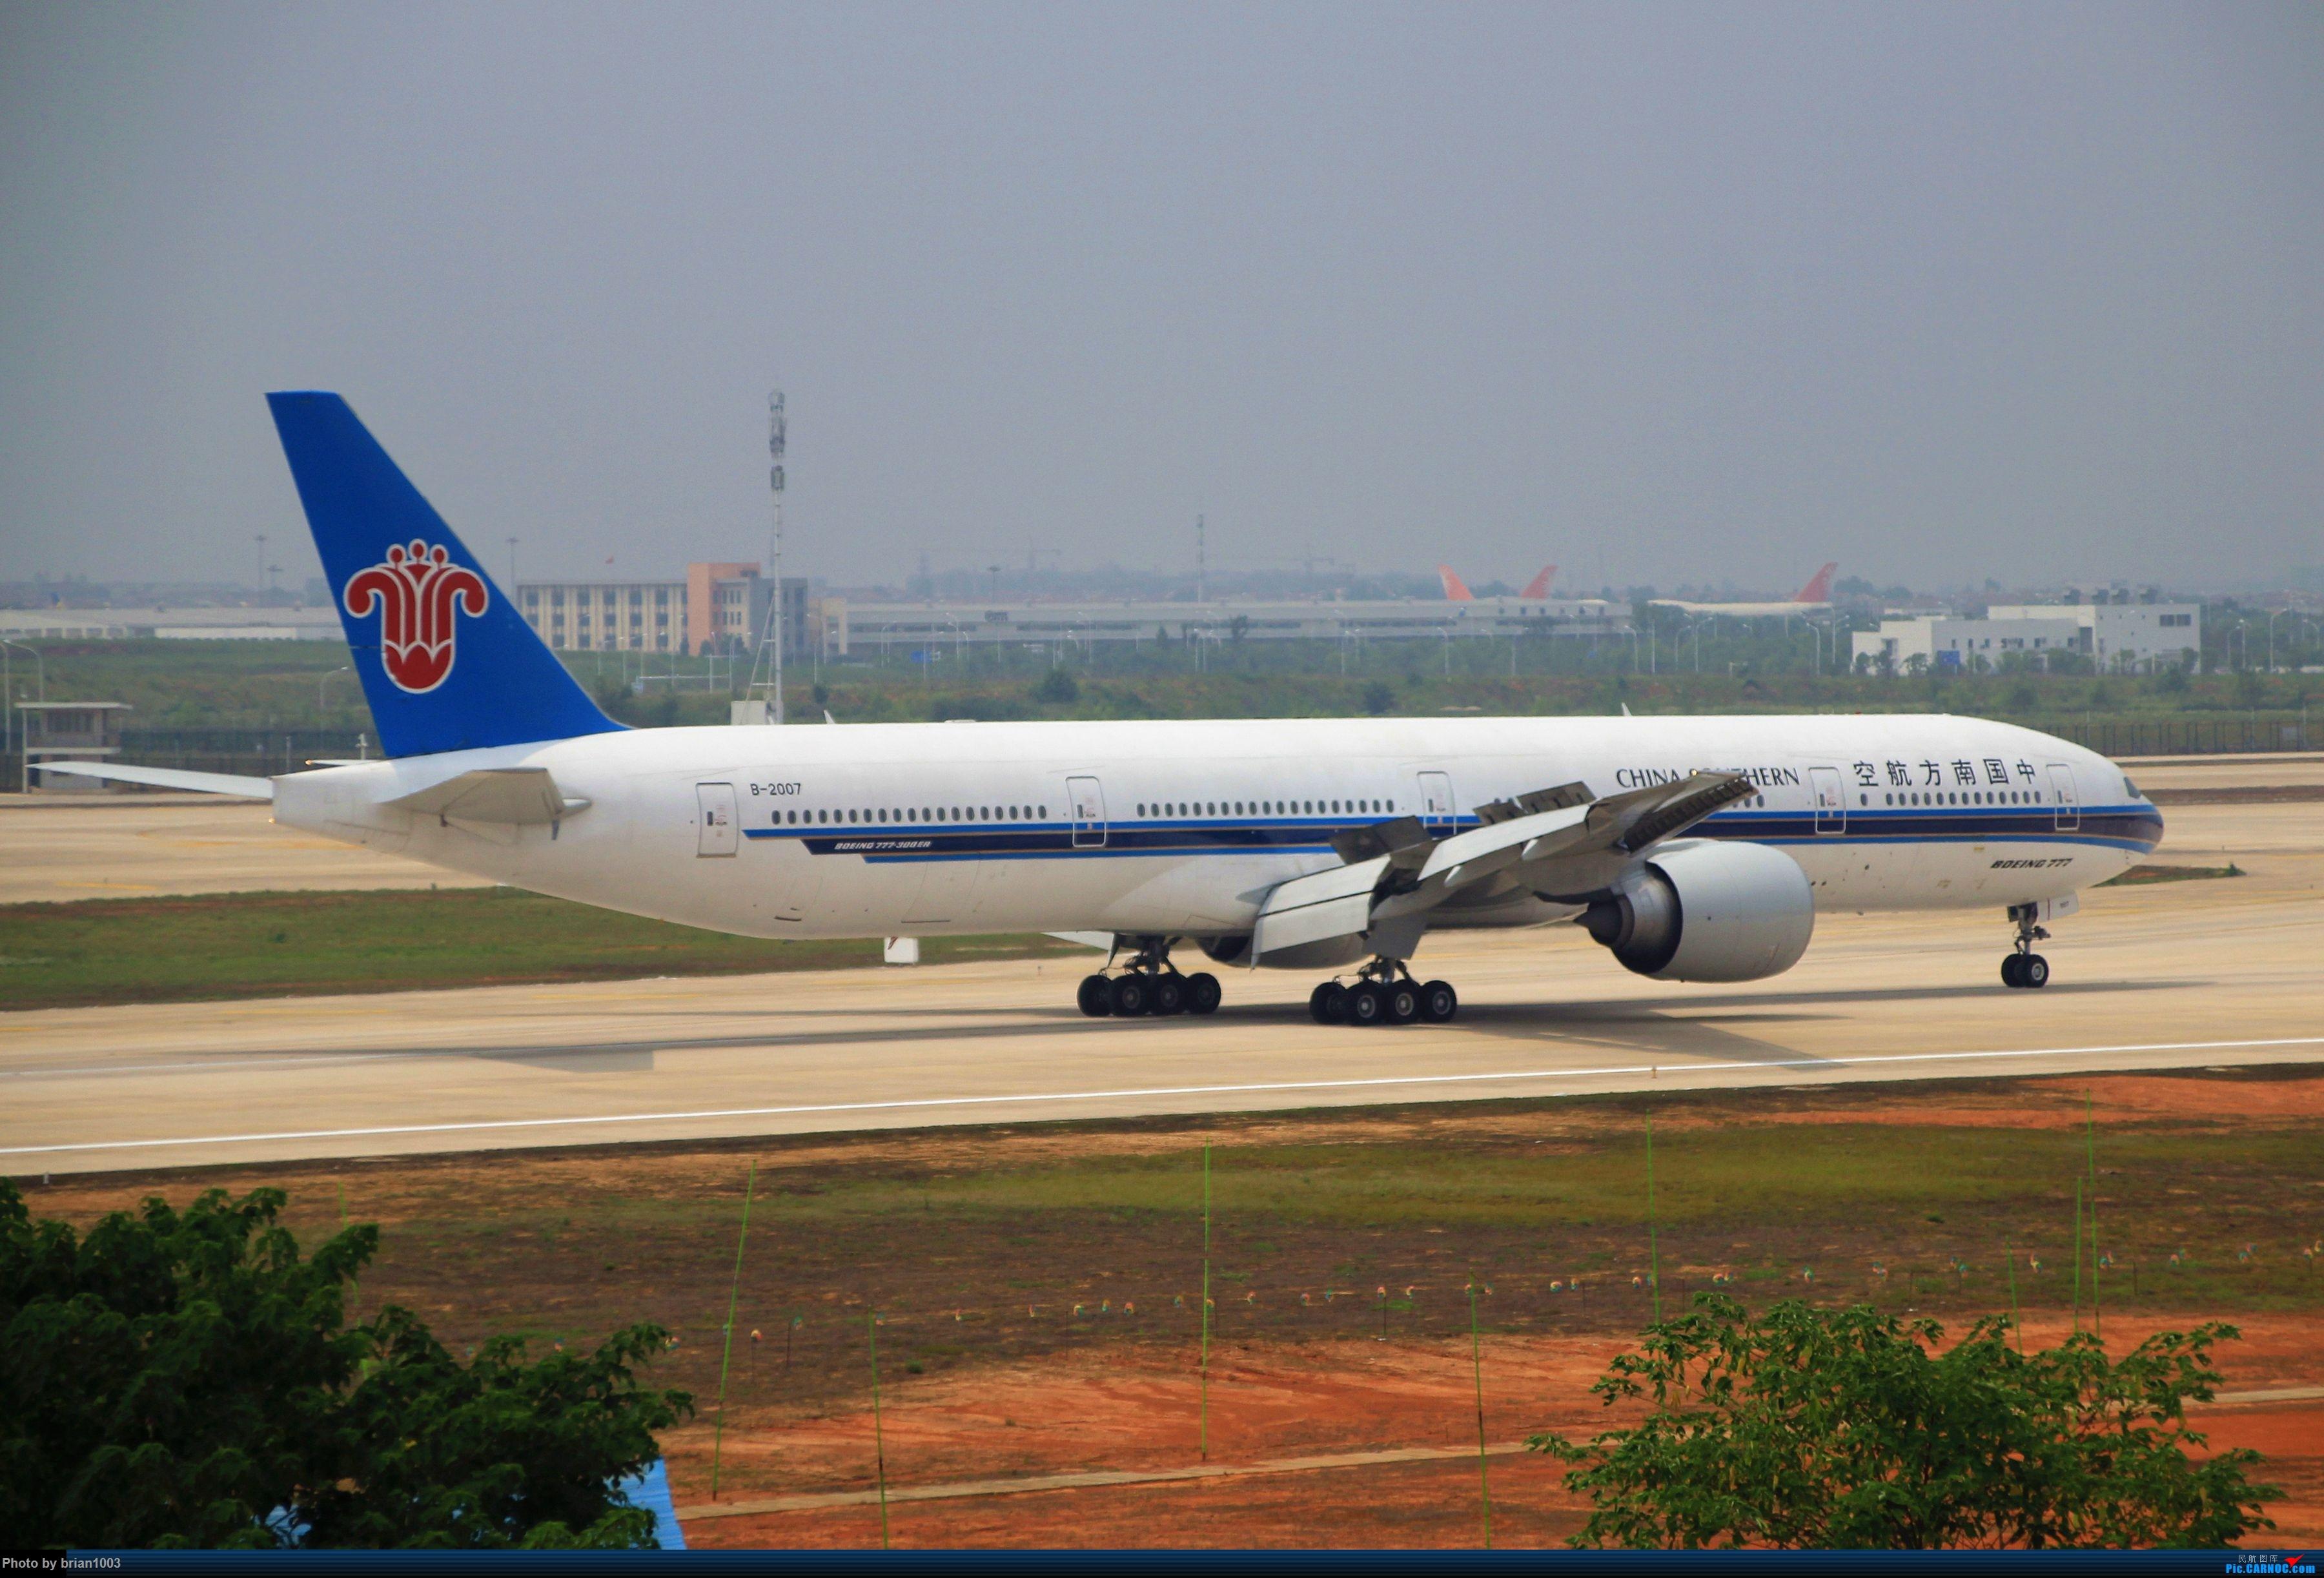 Re:[原创]WUH武汉天河机场拍机之二跑最后忙碌时 BOEING 777-300ER B-2007 中国武汉天河国际机场